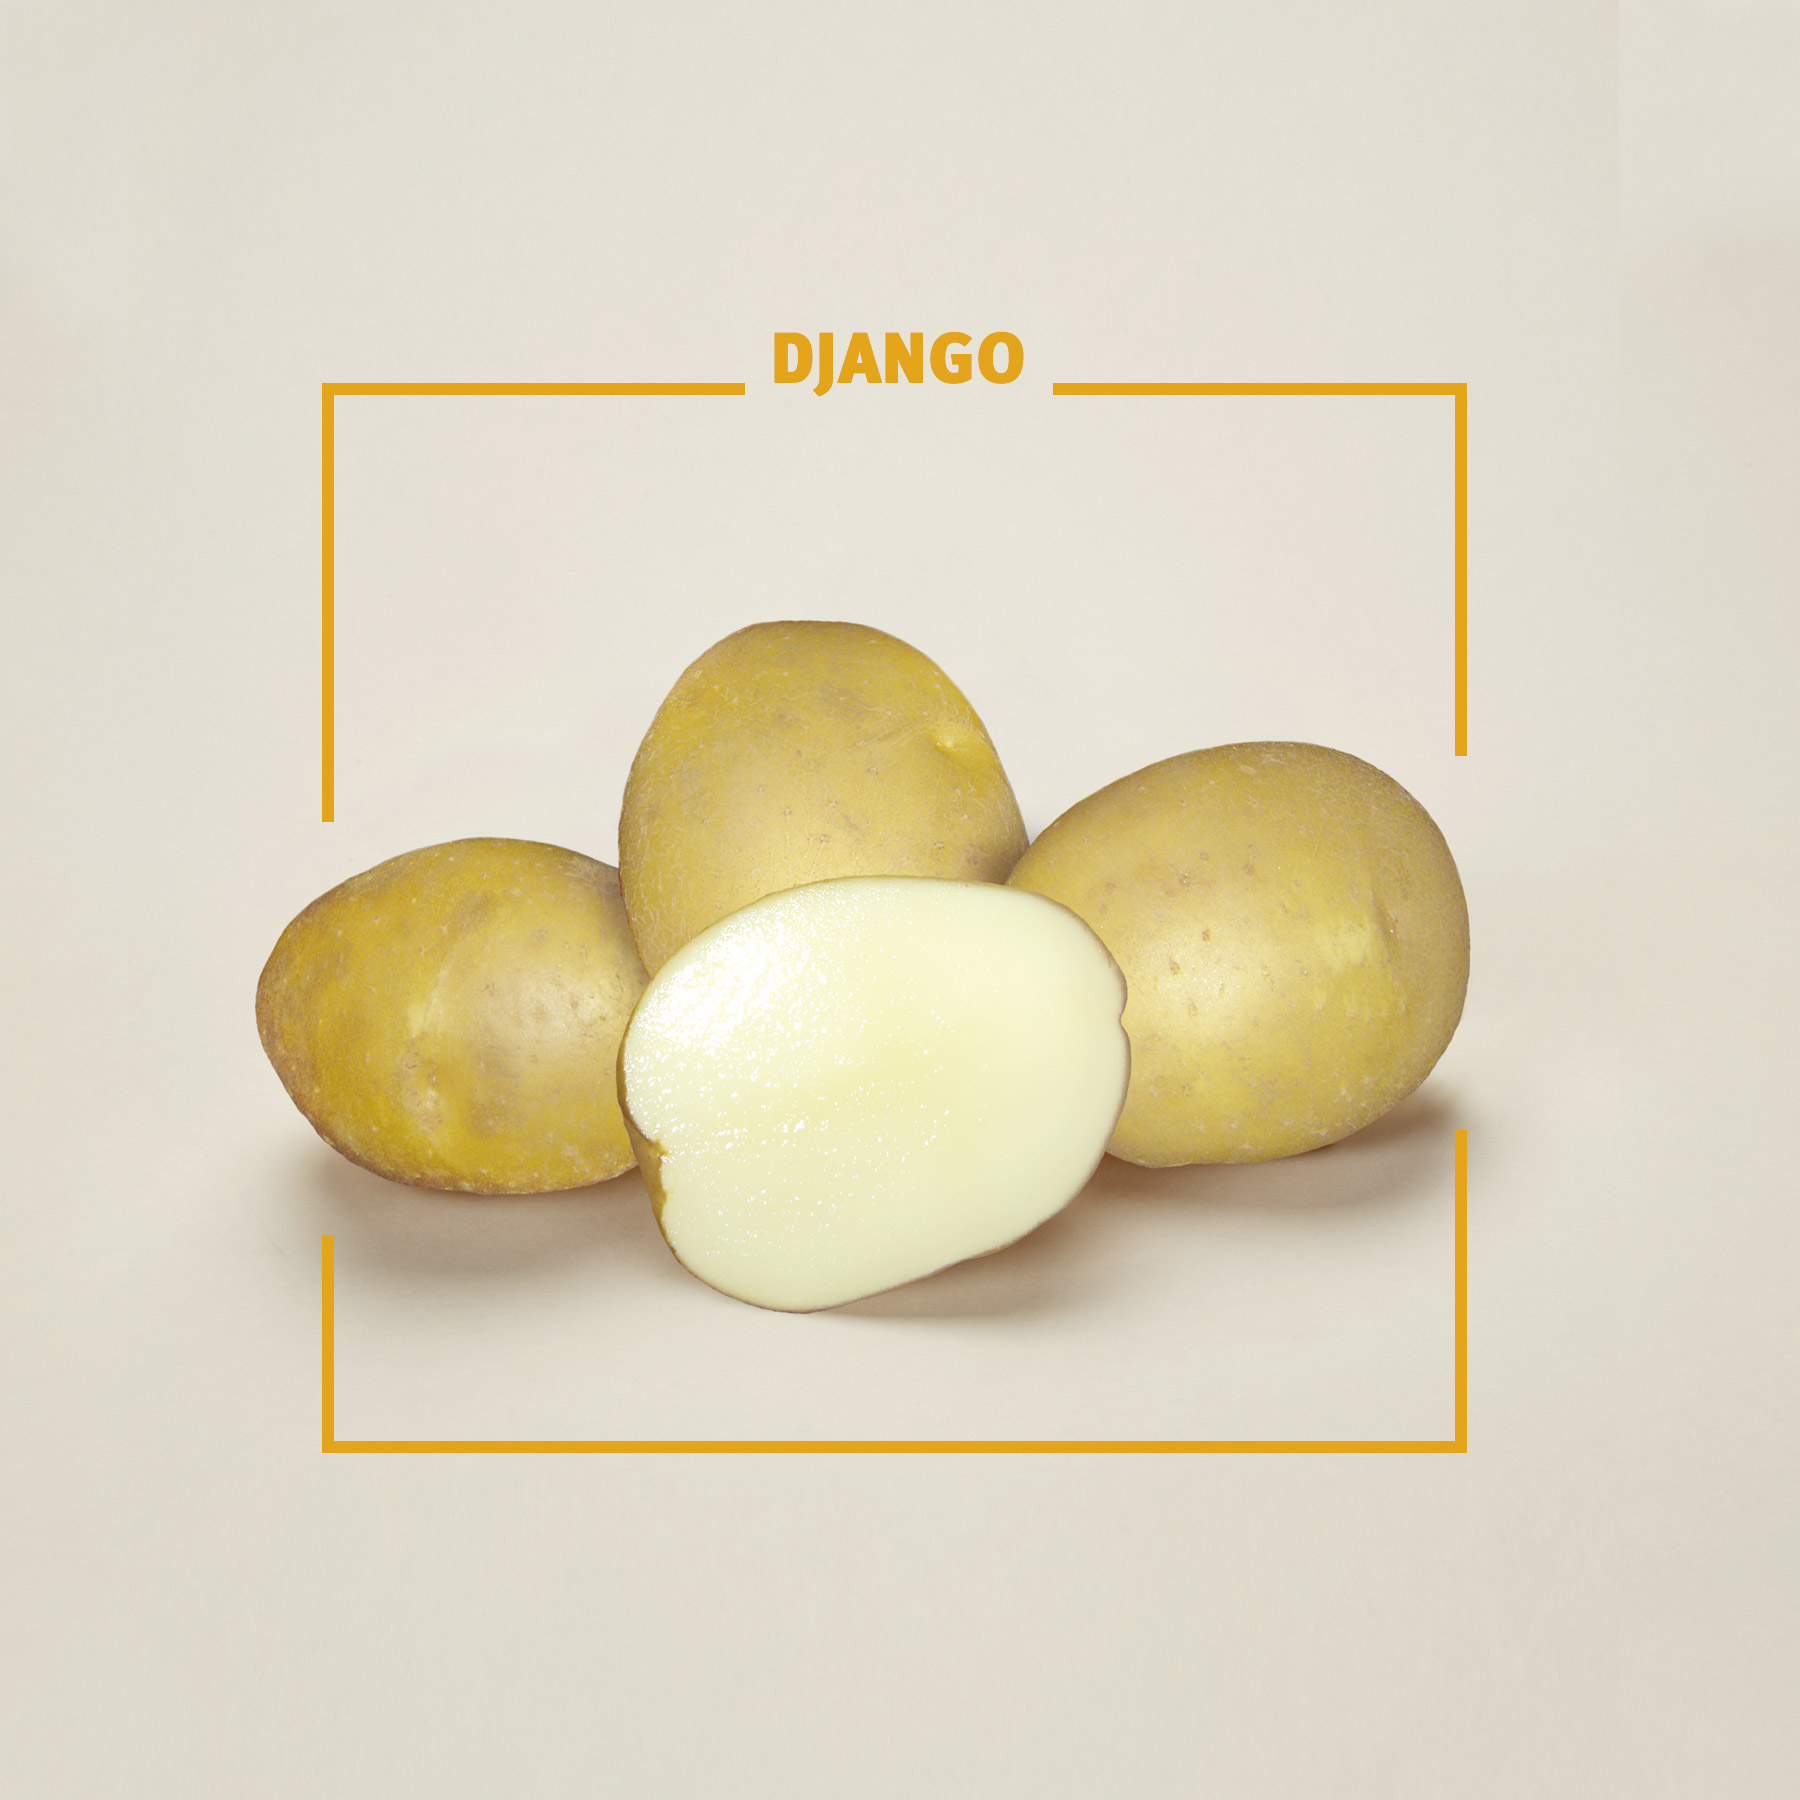 Bavaria Saat, Kartoffelsorte Django